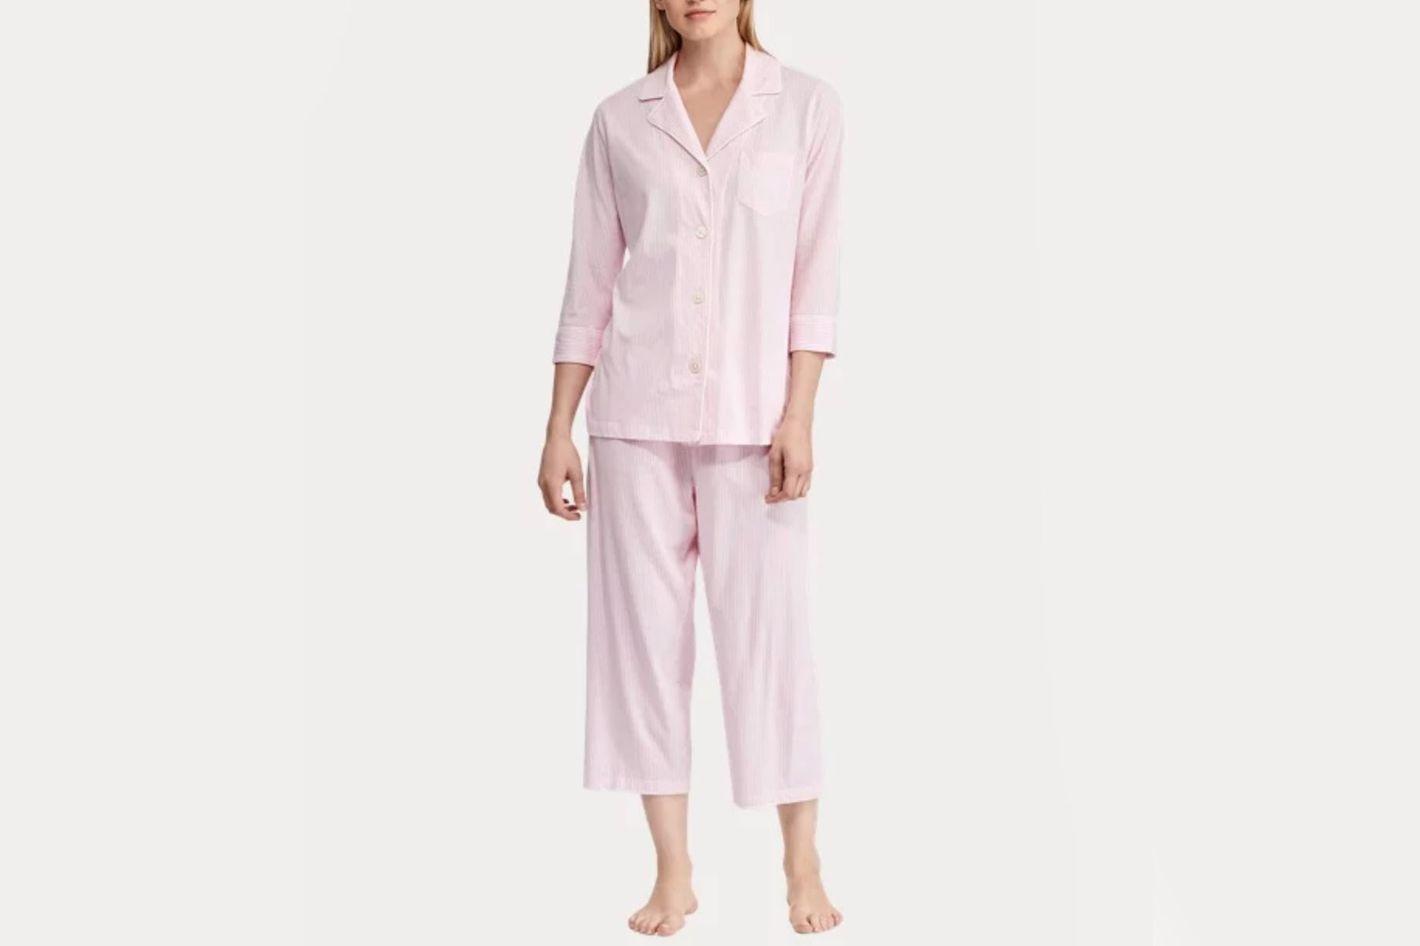 Ralph Lauren Cotton Capri Sleep Set